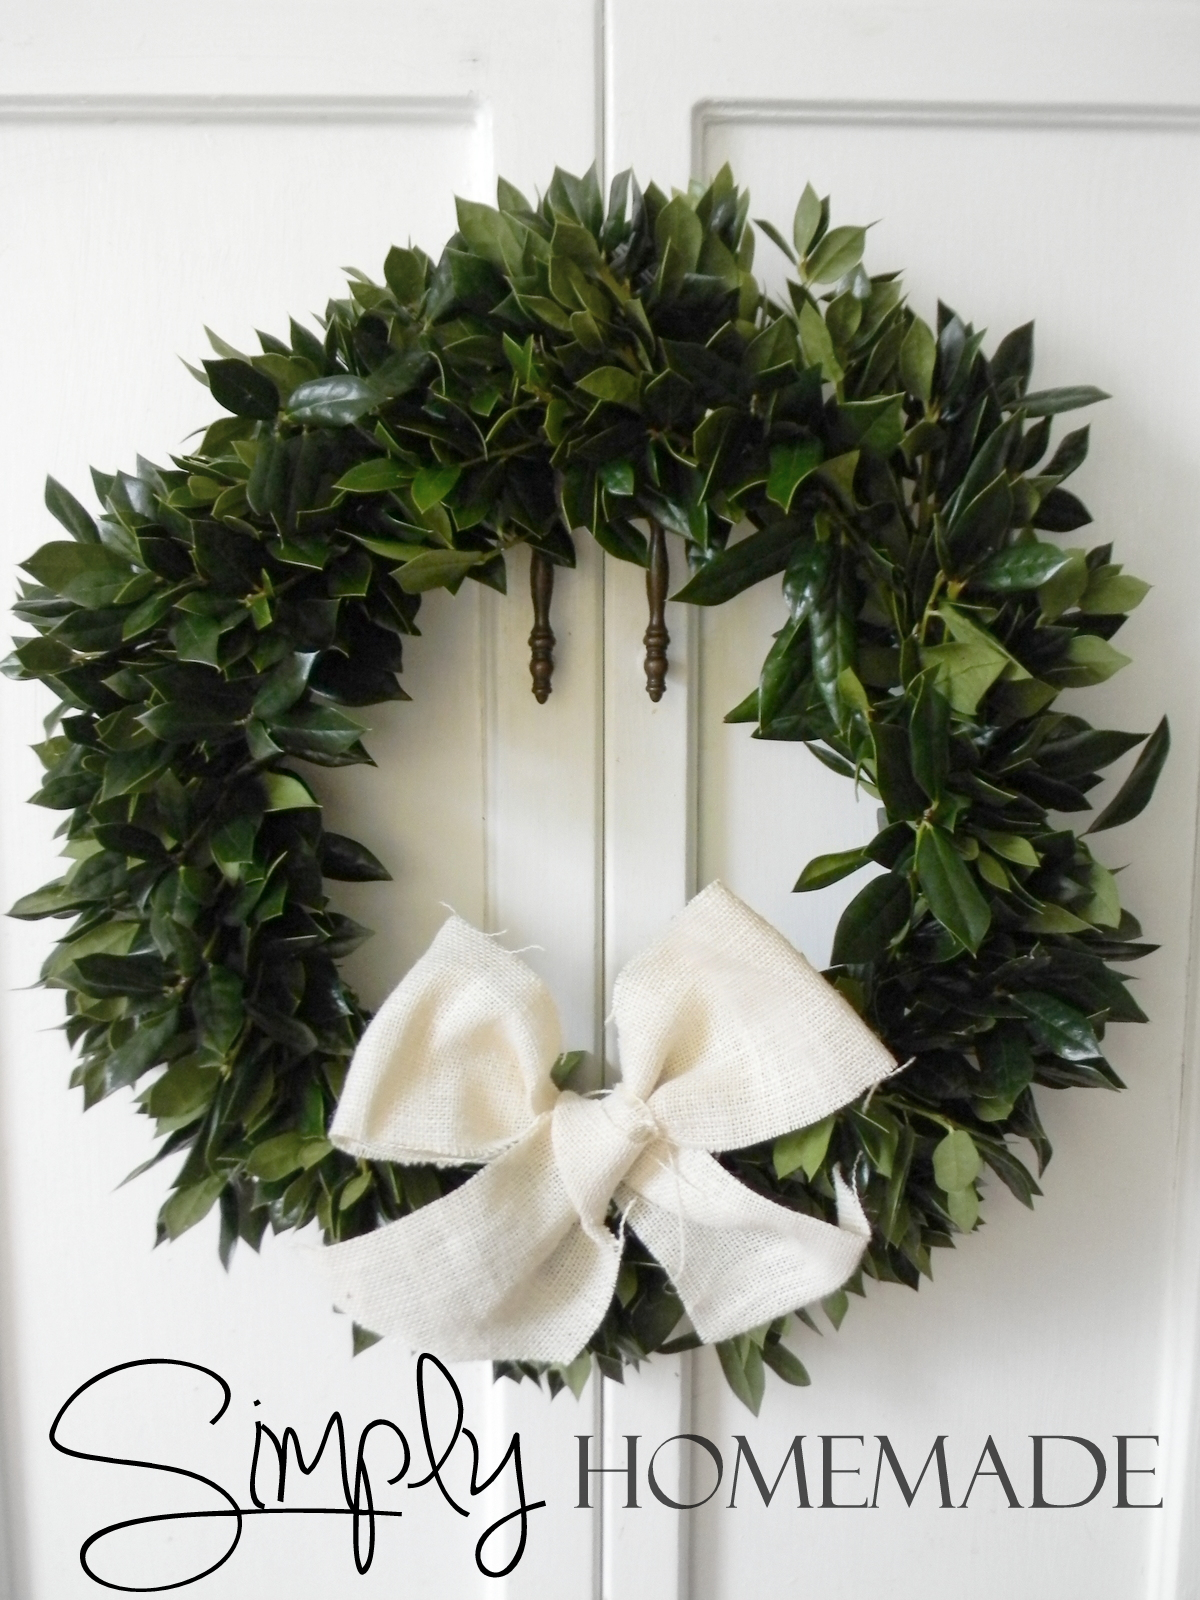 Simply Homemade Diy Holly Wreath Tutorial